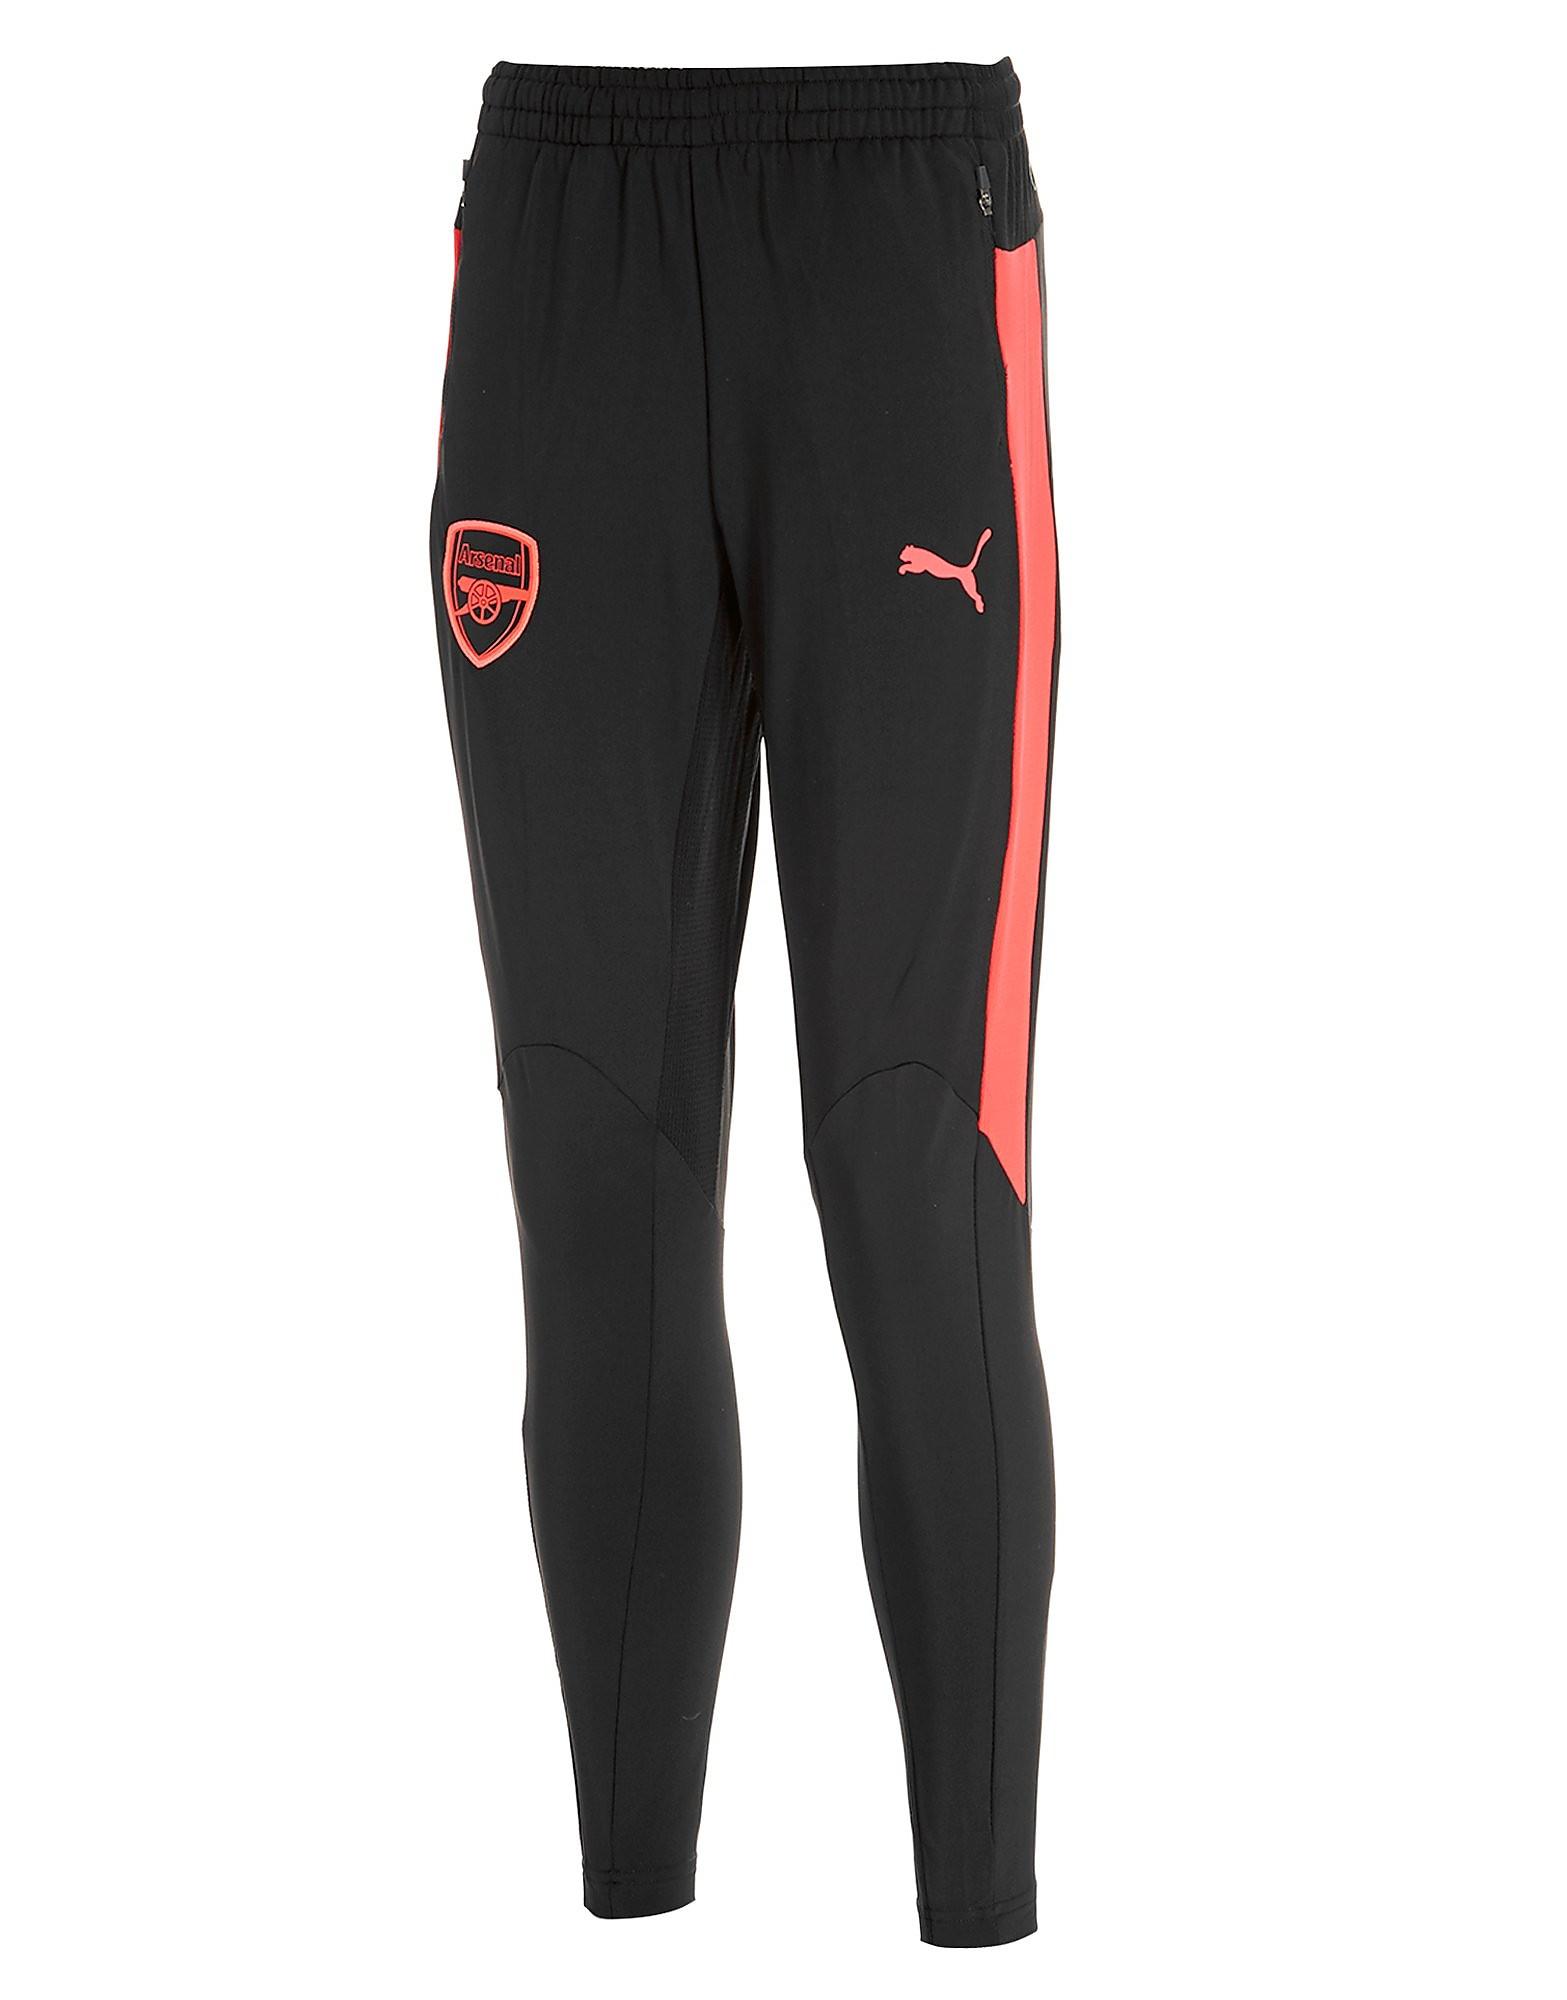 Image of   PUMA Arsenal 2017 Training Pants Junior